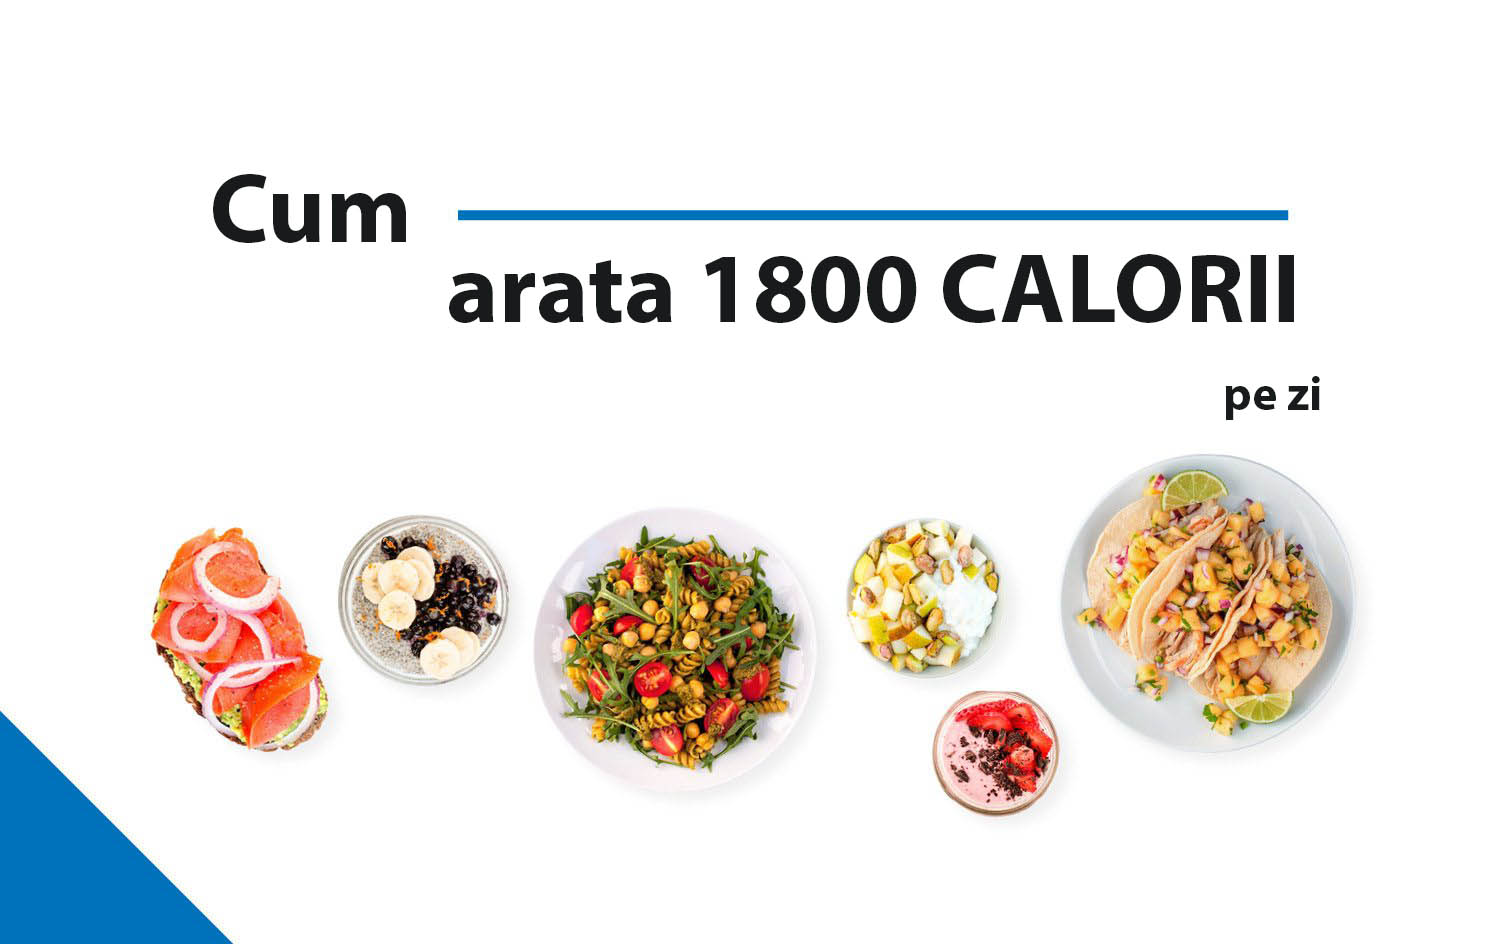 Regim de 1800 de calorii